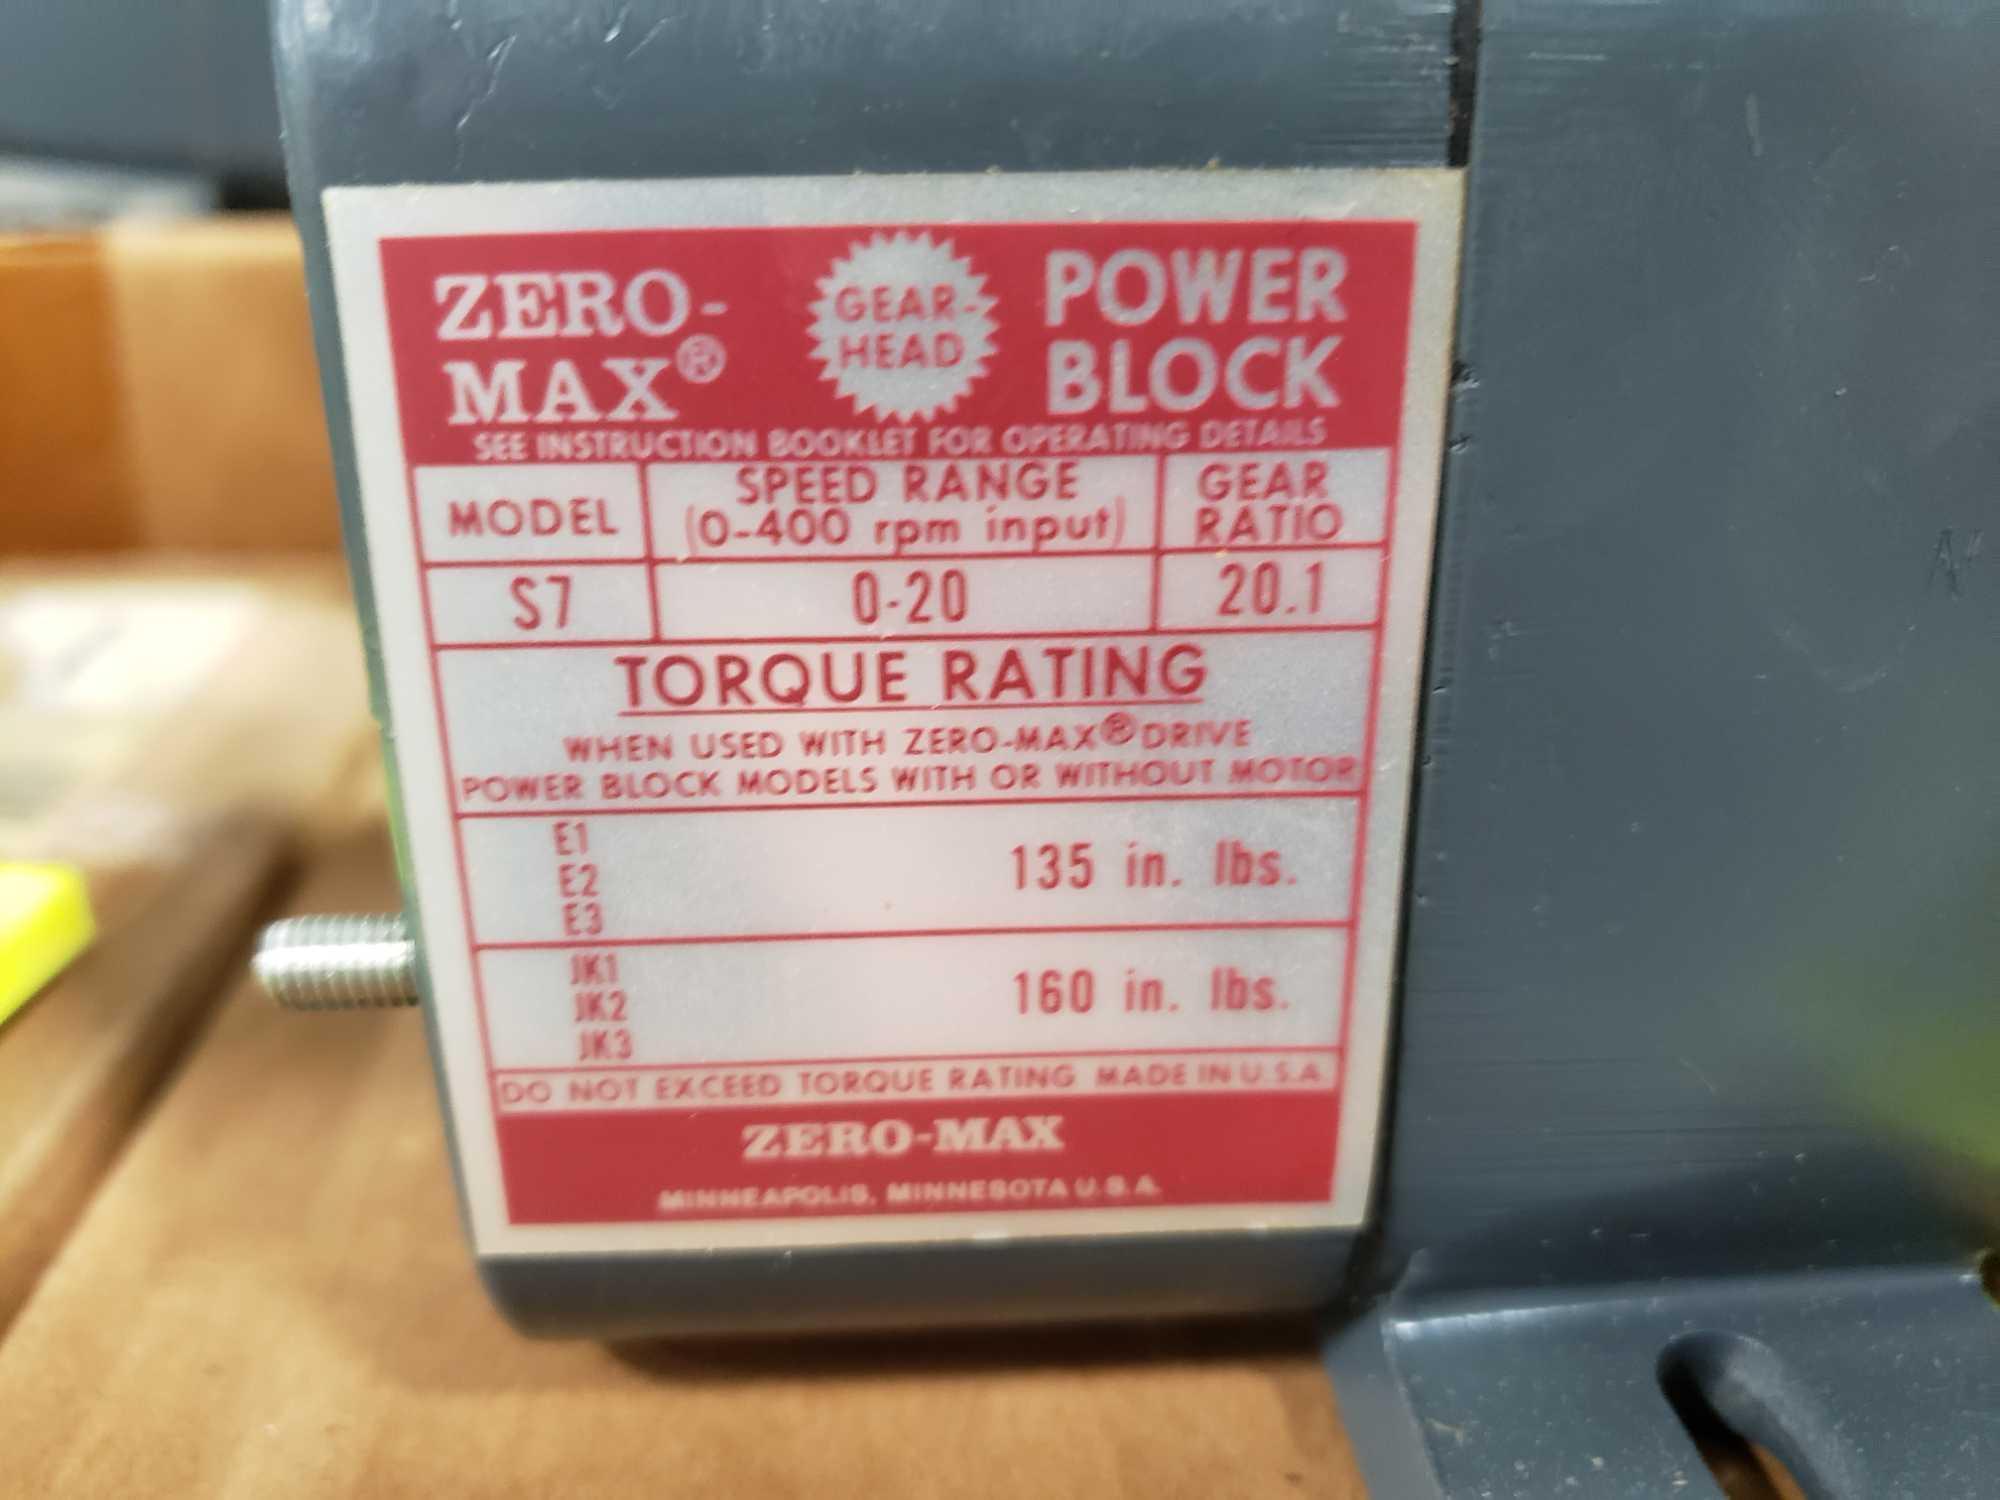 Zero-max gearhead power block model S7, 0-20 output rotation, 12lb torque, 20:1 range. New in box. - Image 2 of 3